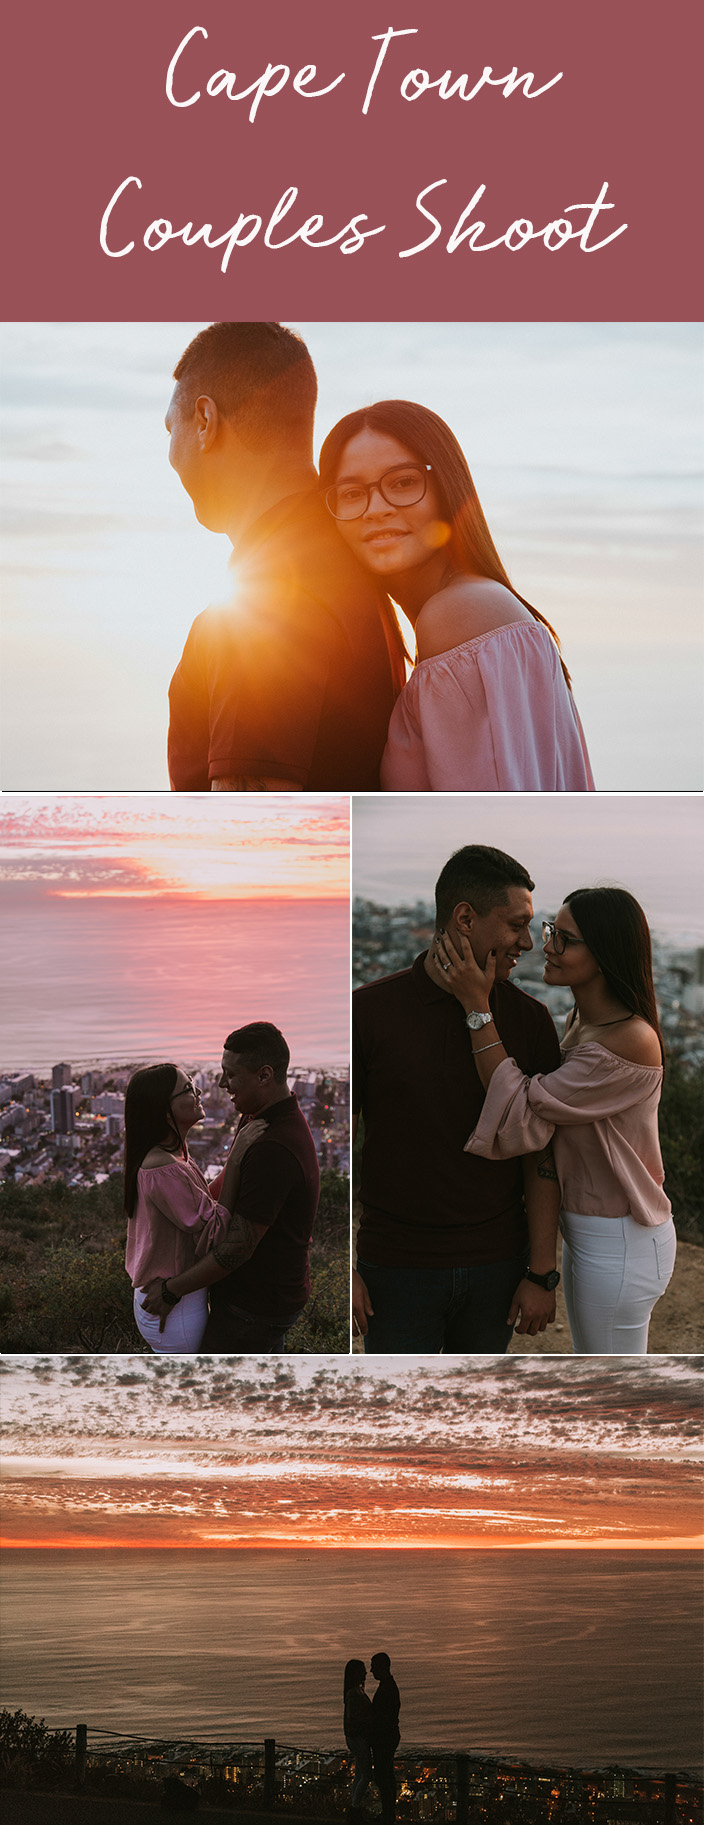 Cape Town couples shoot.jpg